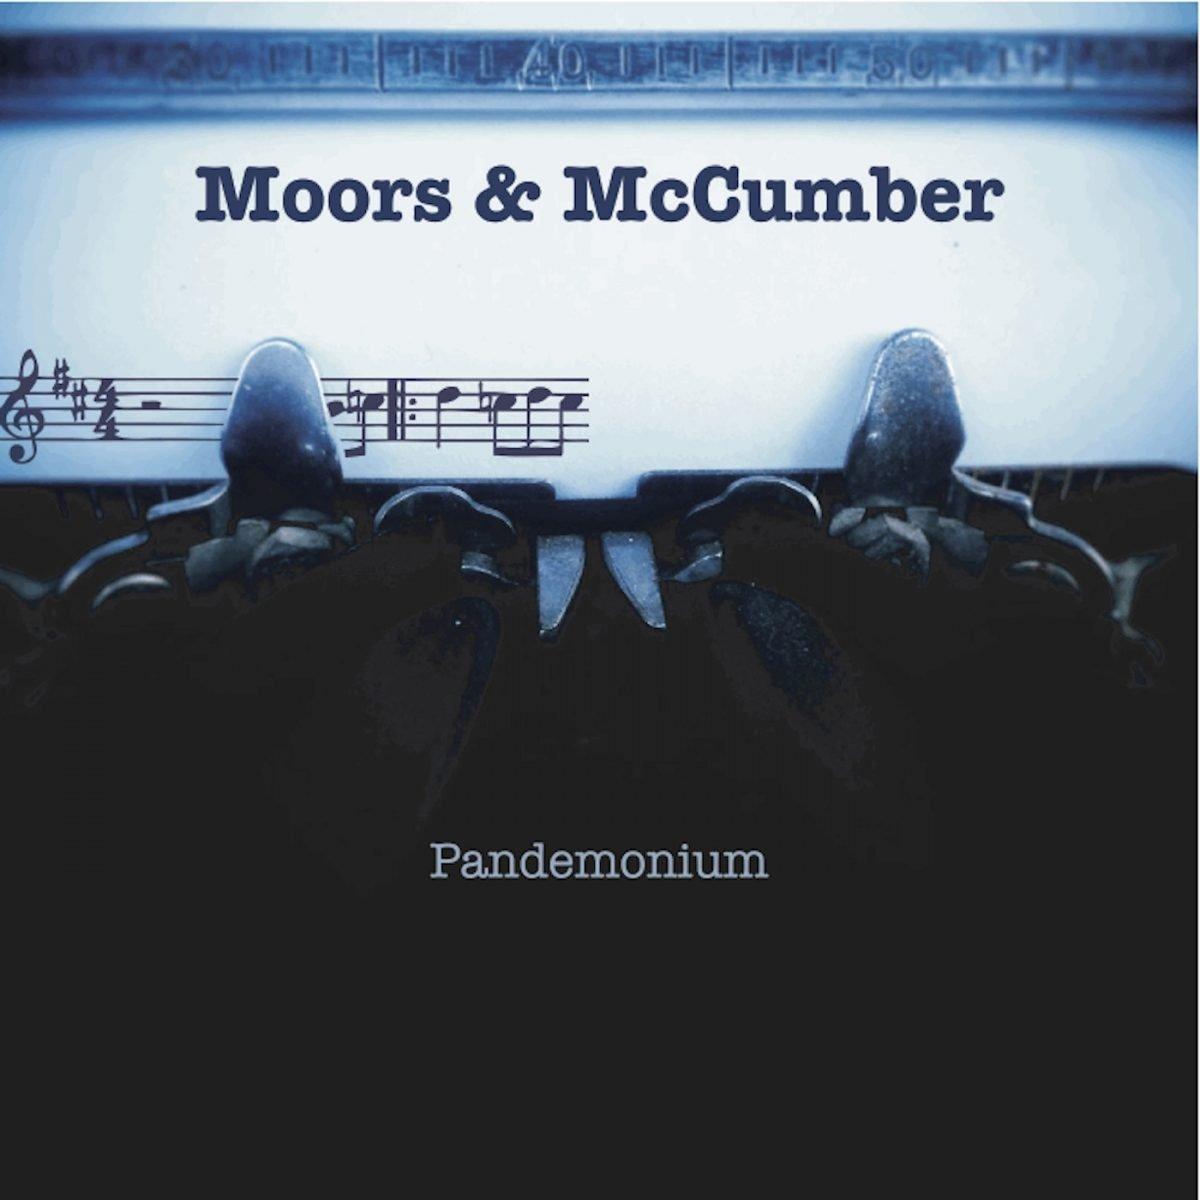 Moors & McCumber - Pandemonium Album Art